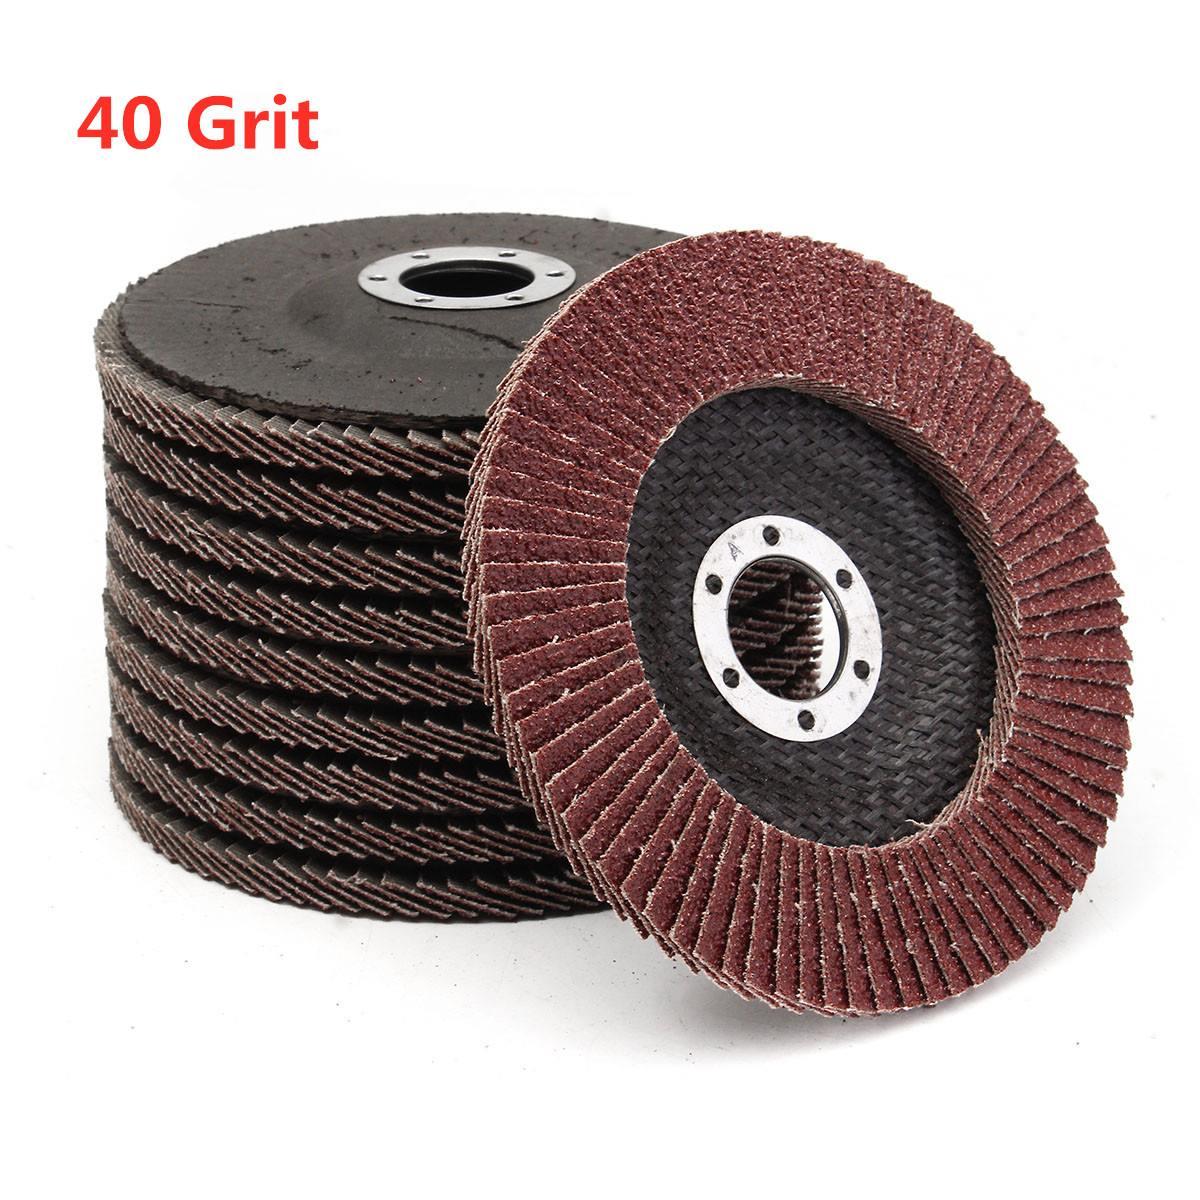 10pcs 5 Inch 125mm 40 Grit Flap Discs Aluminum Oxide Flap Disc Sanding Grinding Wheel Abrasive Tools